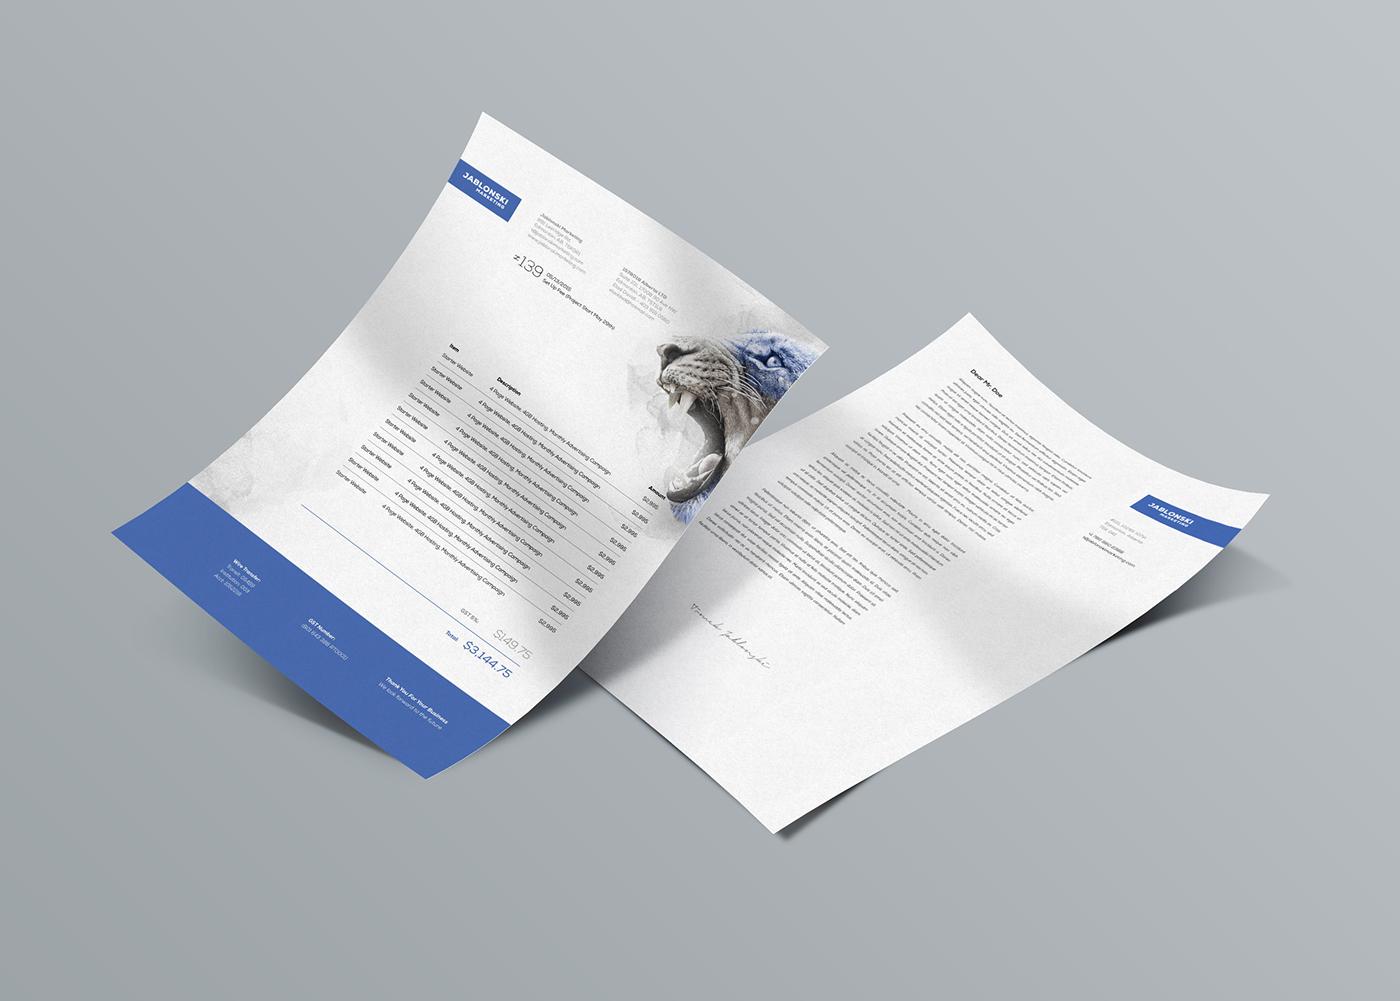 business card letterhead envelope folder marketing   logo poster wall Stationery t-shirt lion octopus deer bear bison